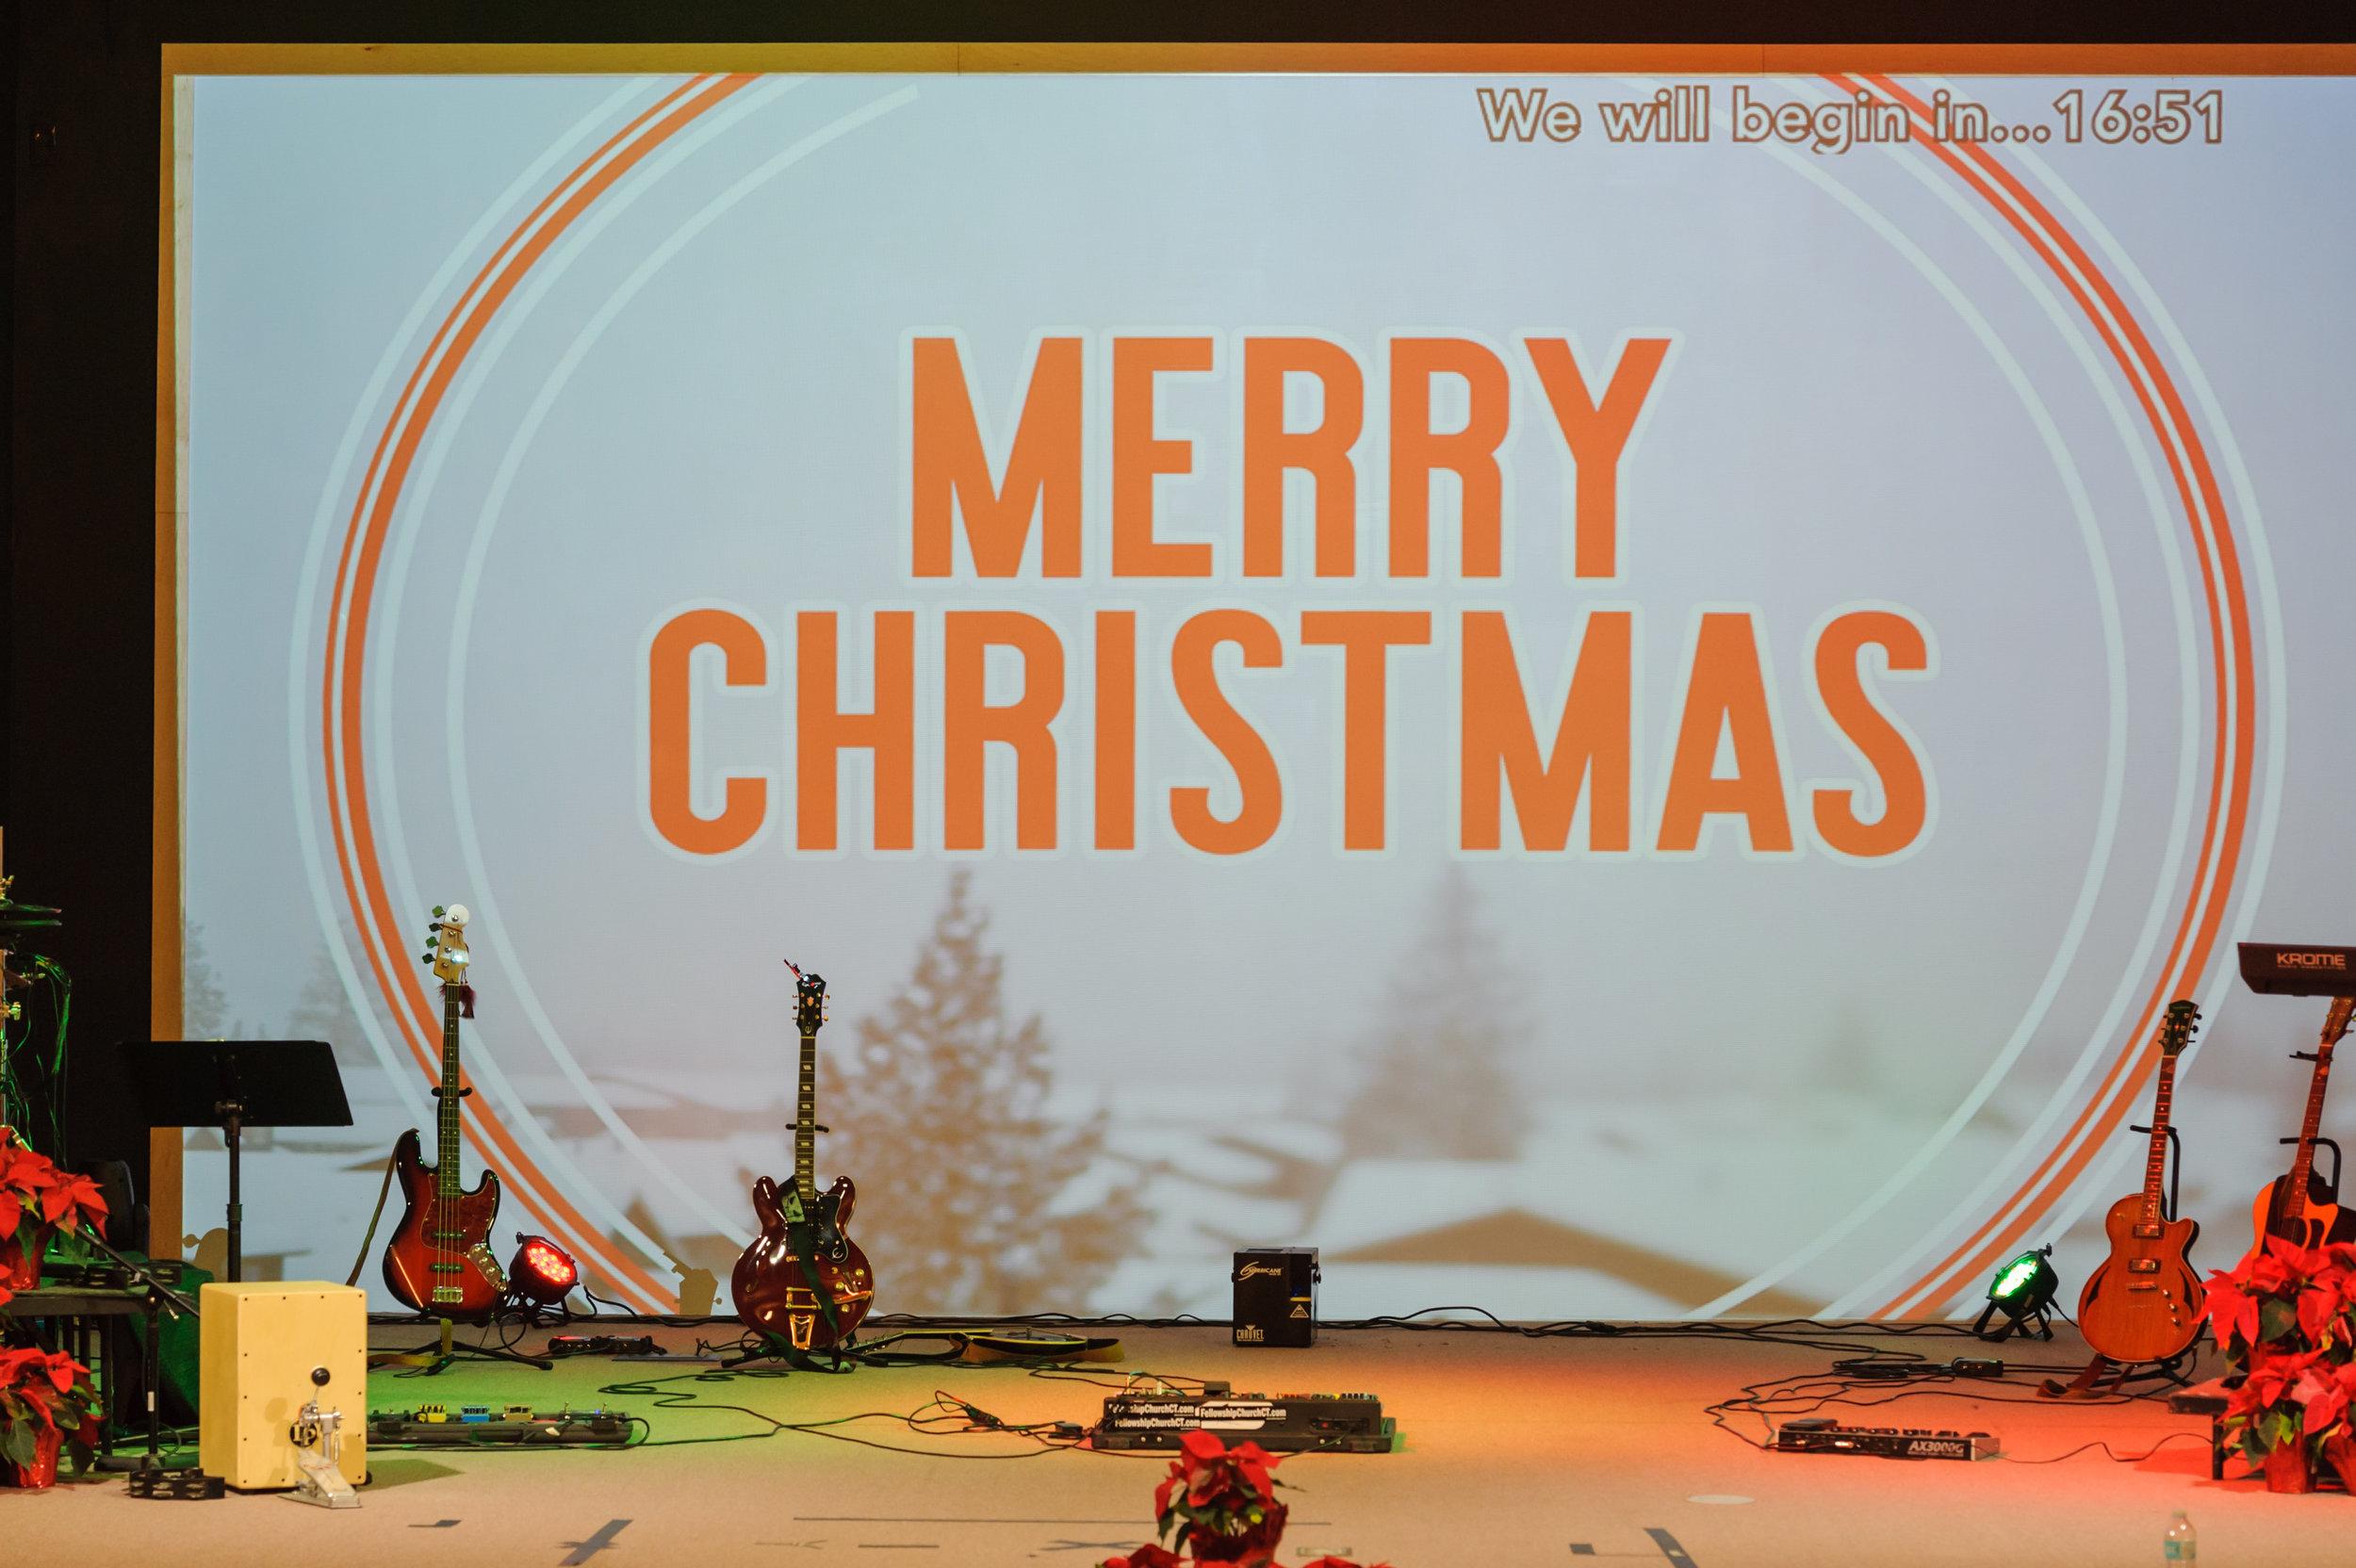 Merry Christmas service pic.jpg